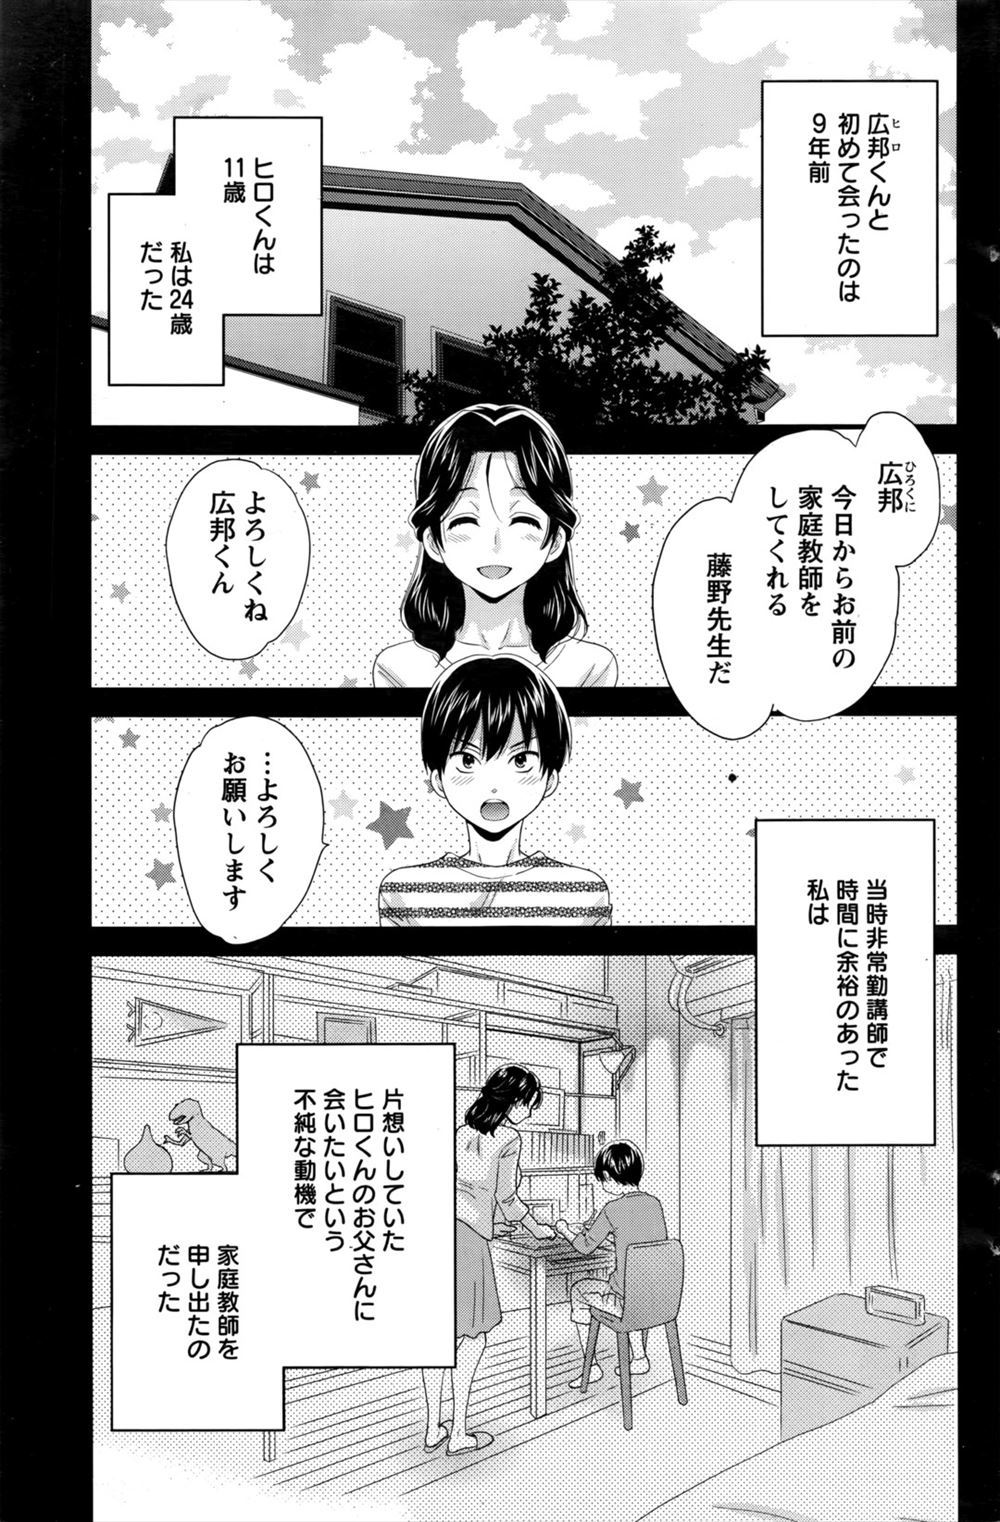 貴花田 エロ 漫画